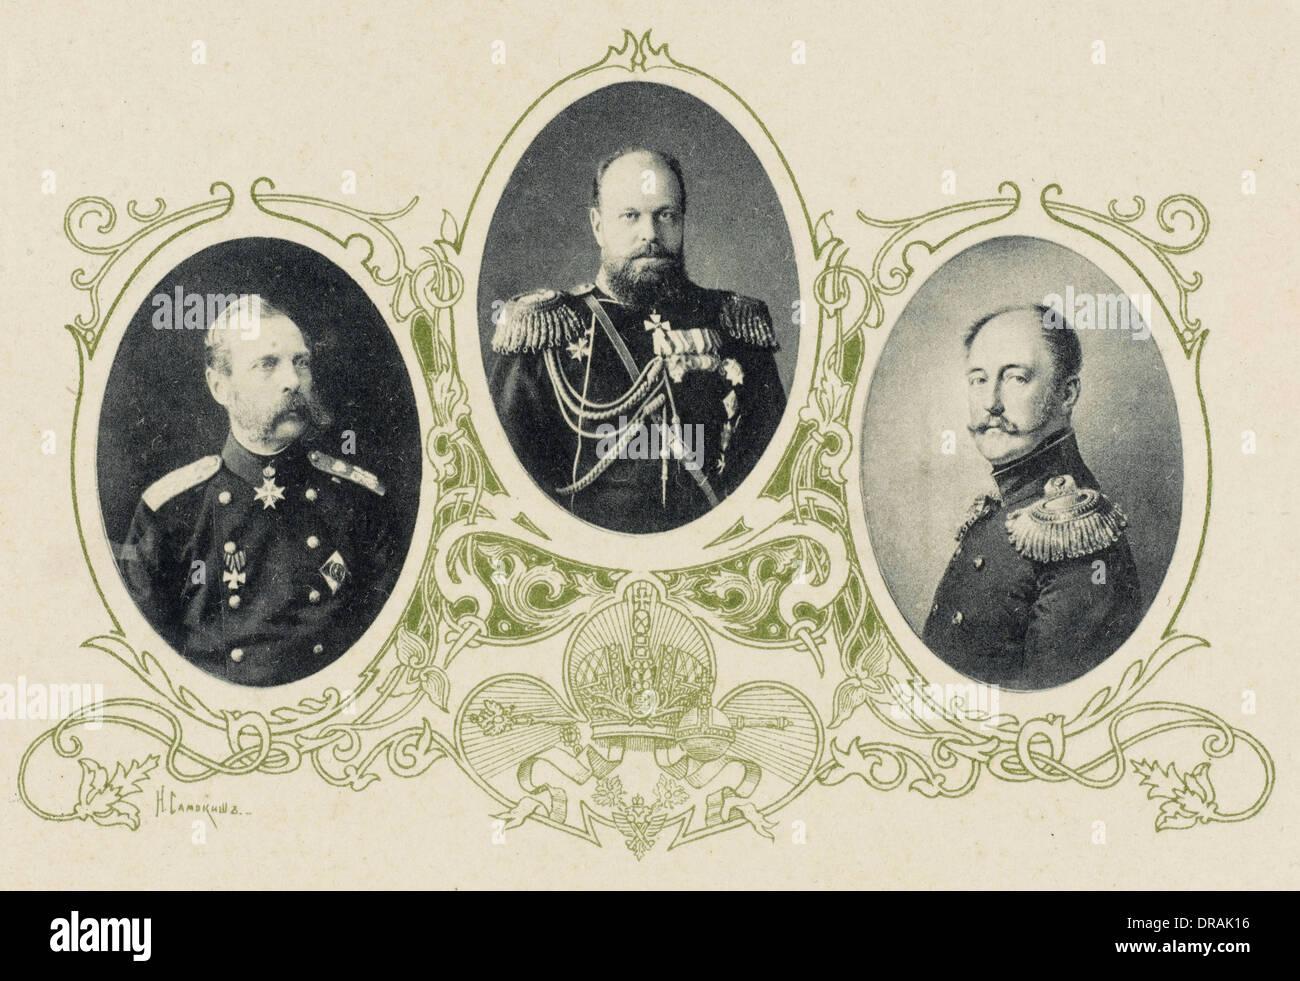 Alexander II, Alexander III and Nicholas I of Russia